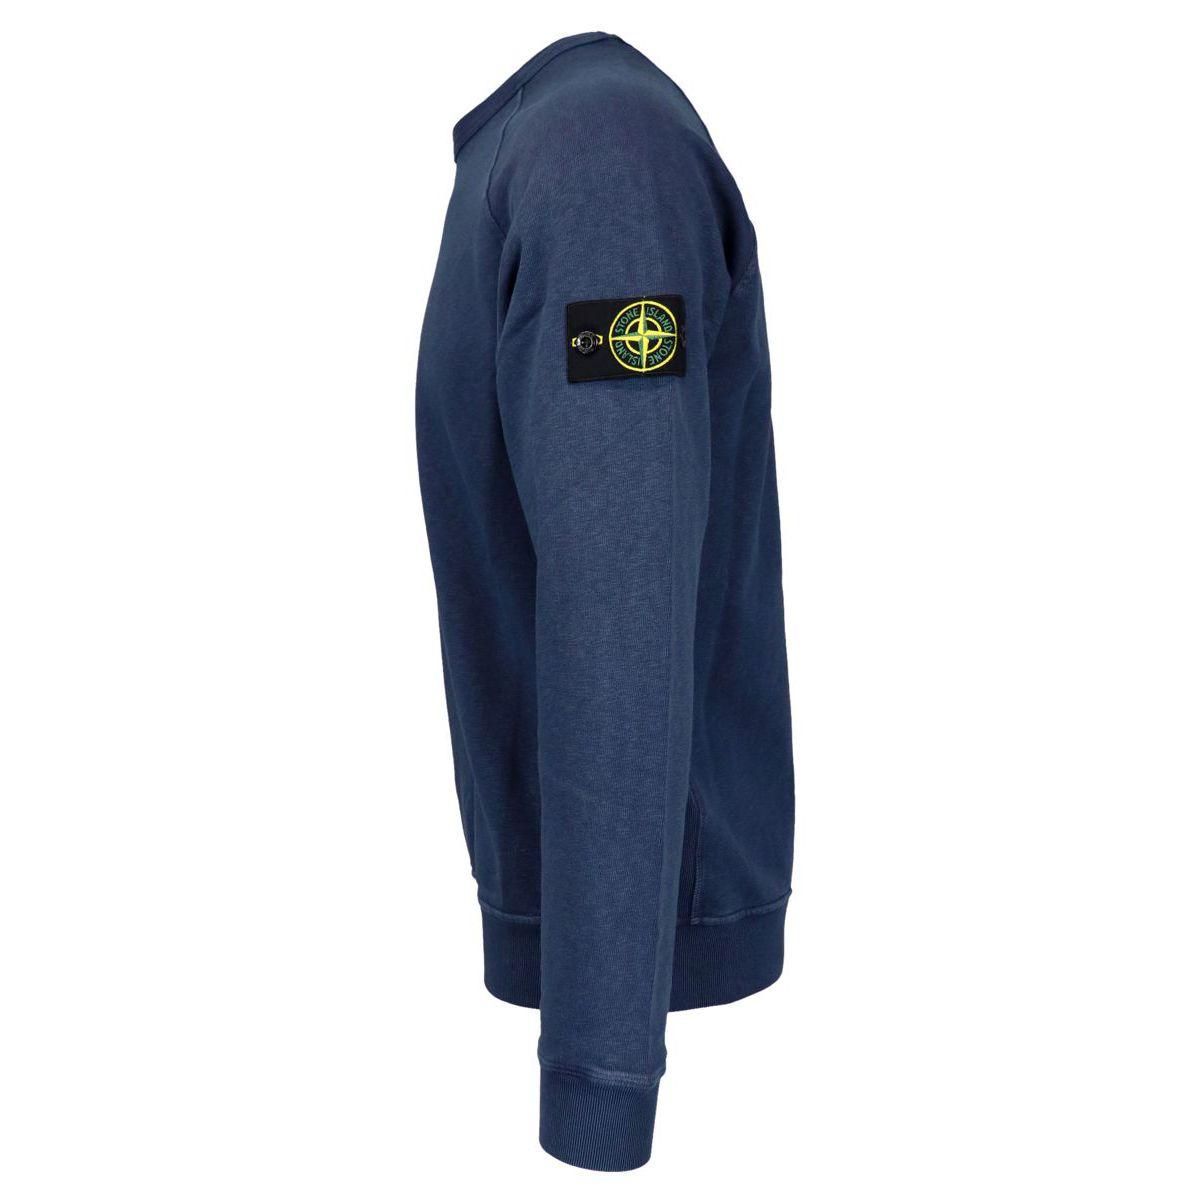 """Washed effect"" crewneck sweatshirt with logo patch Navy Stone Island"